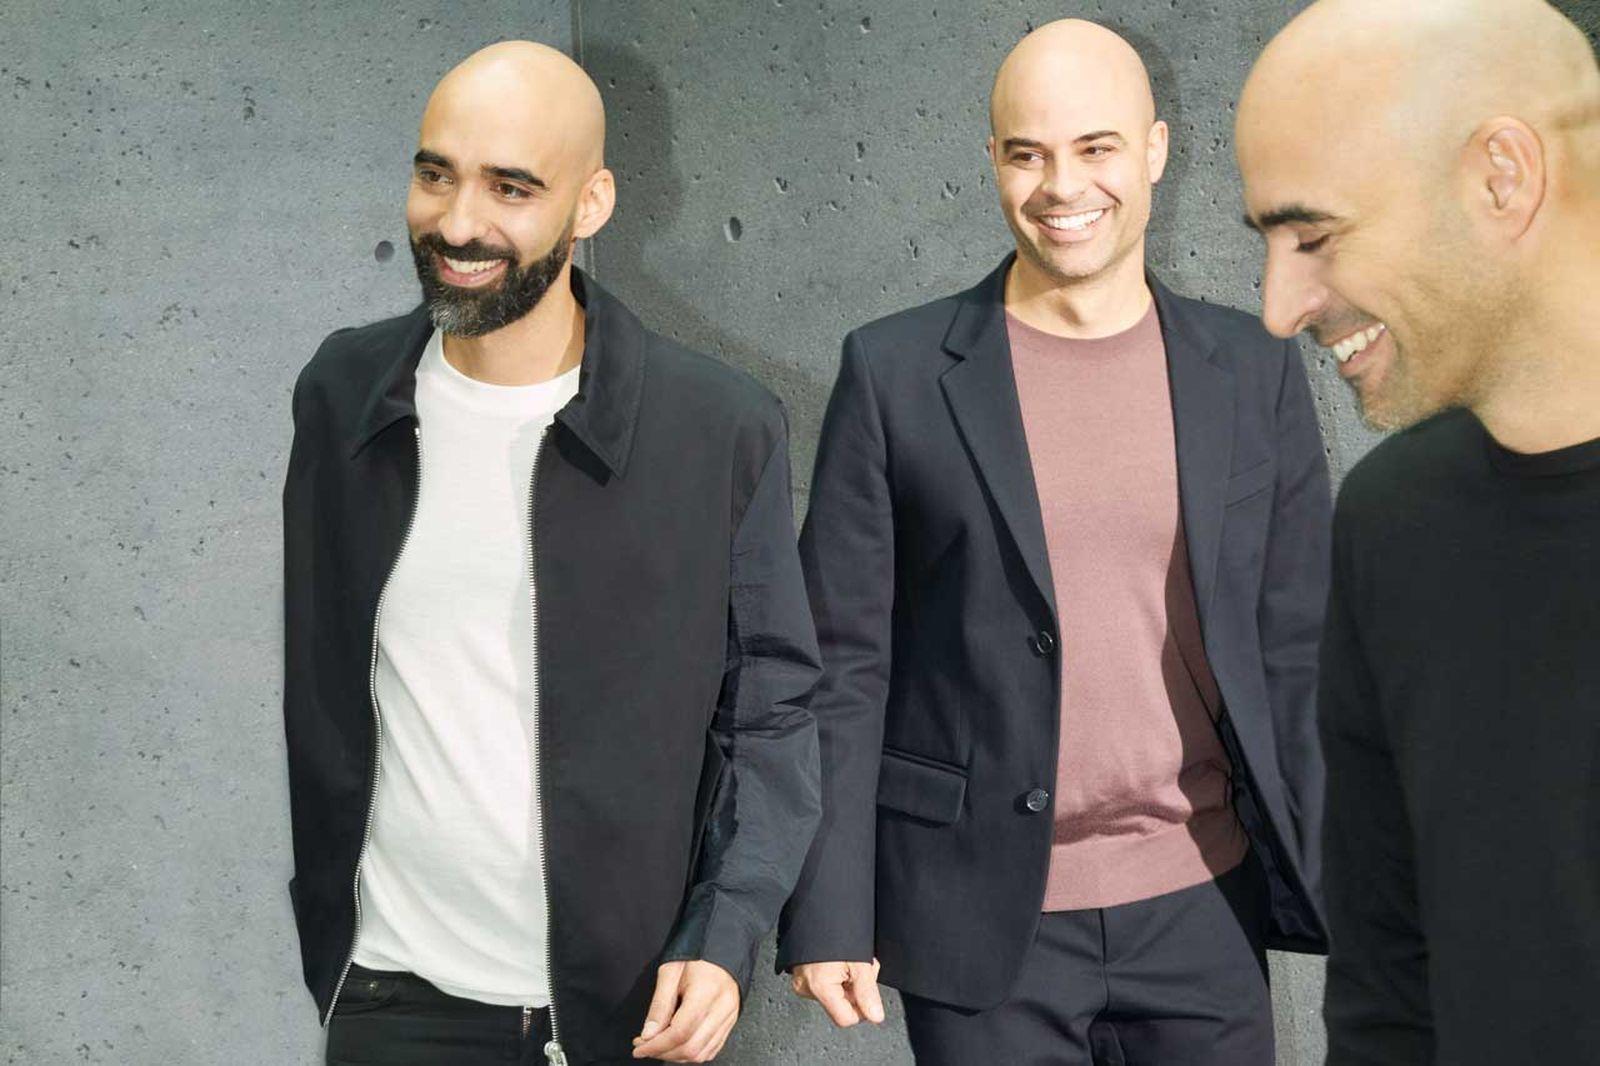 Left to right: Bassel Atallah, Firas Atallah, Rami Atallah